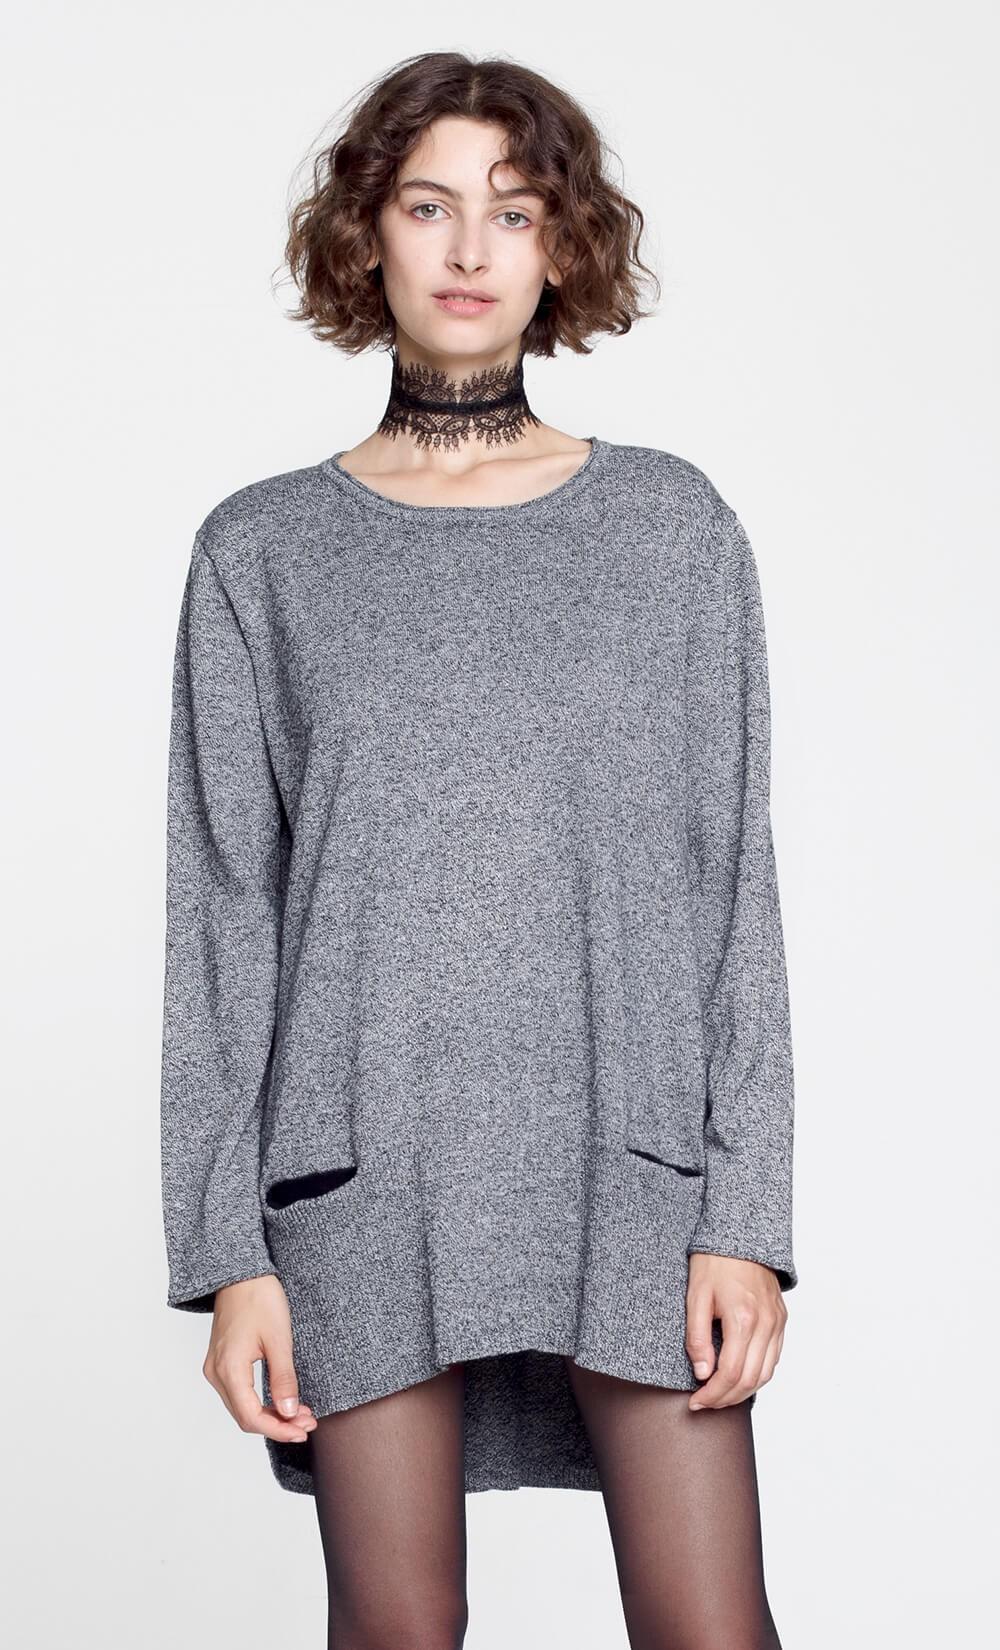 Albatross Knit